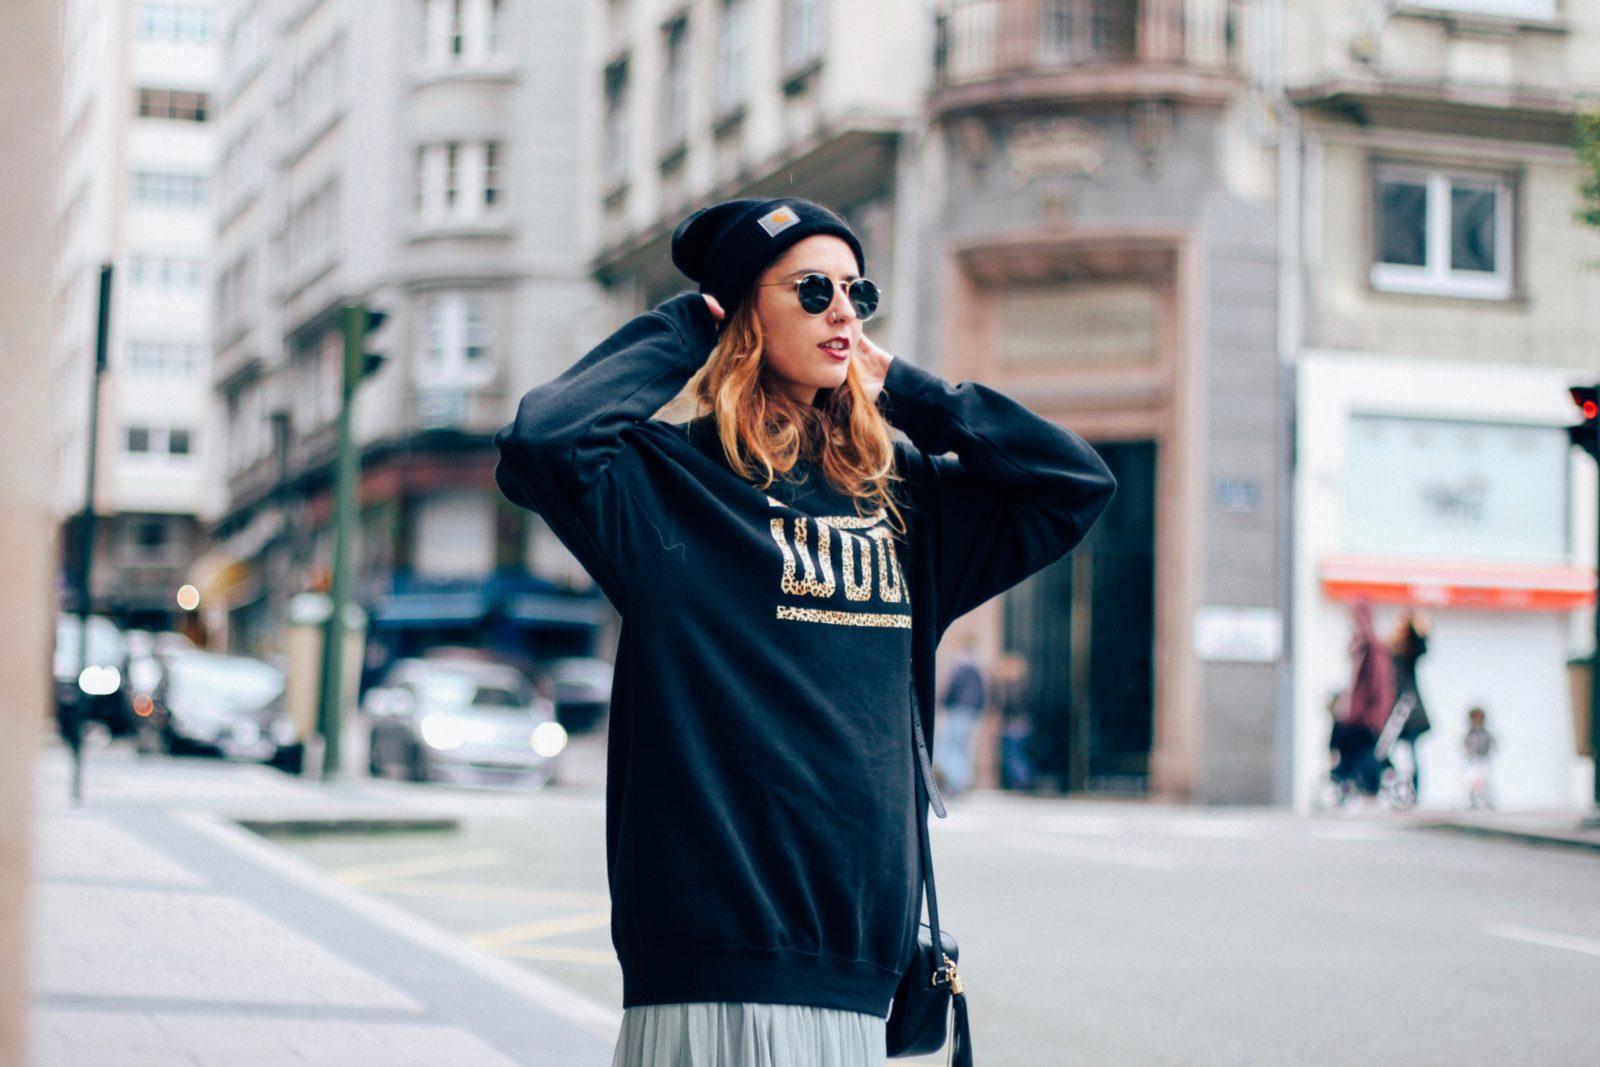 sudadera_old_dogs_falda_de_tul_vans_beanie_carhartt_look_donkeycool_street_style-13